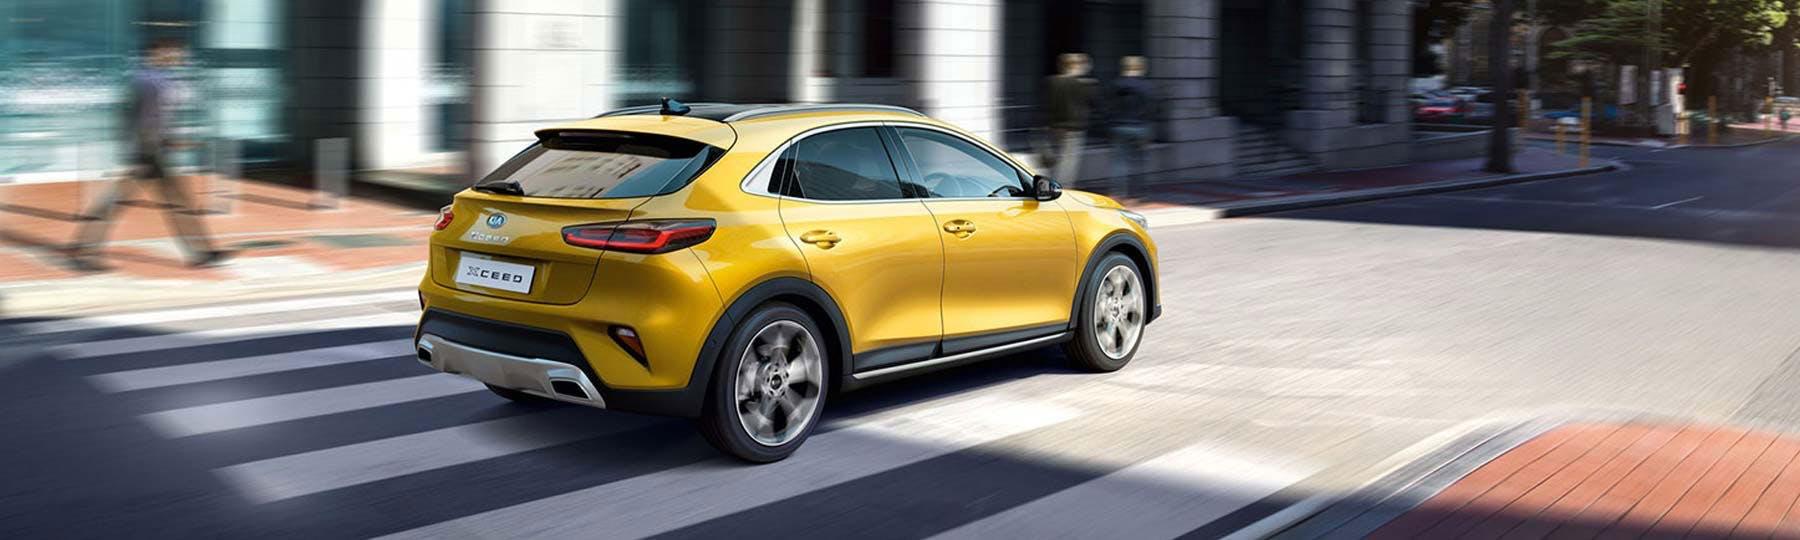 All-New Kia XCeed Motability